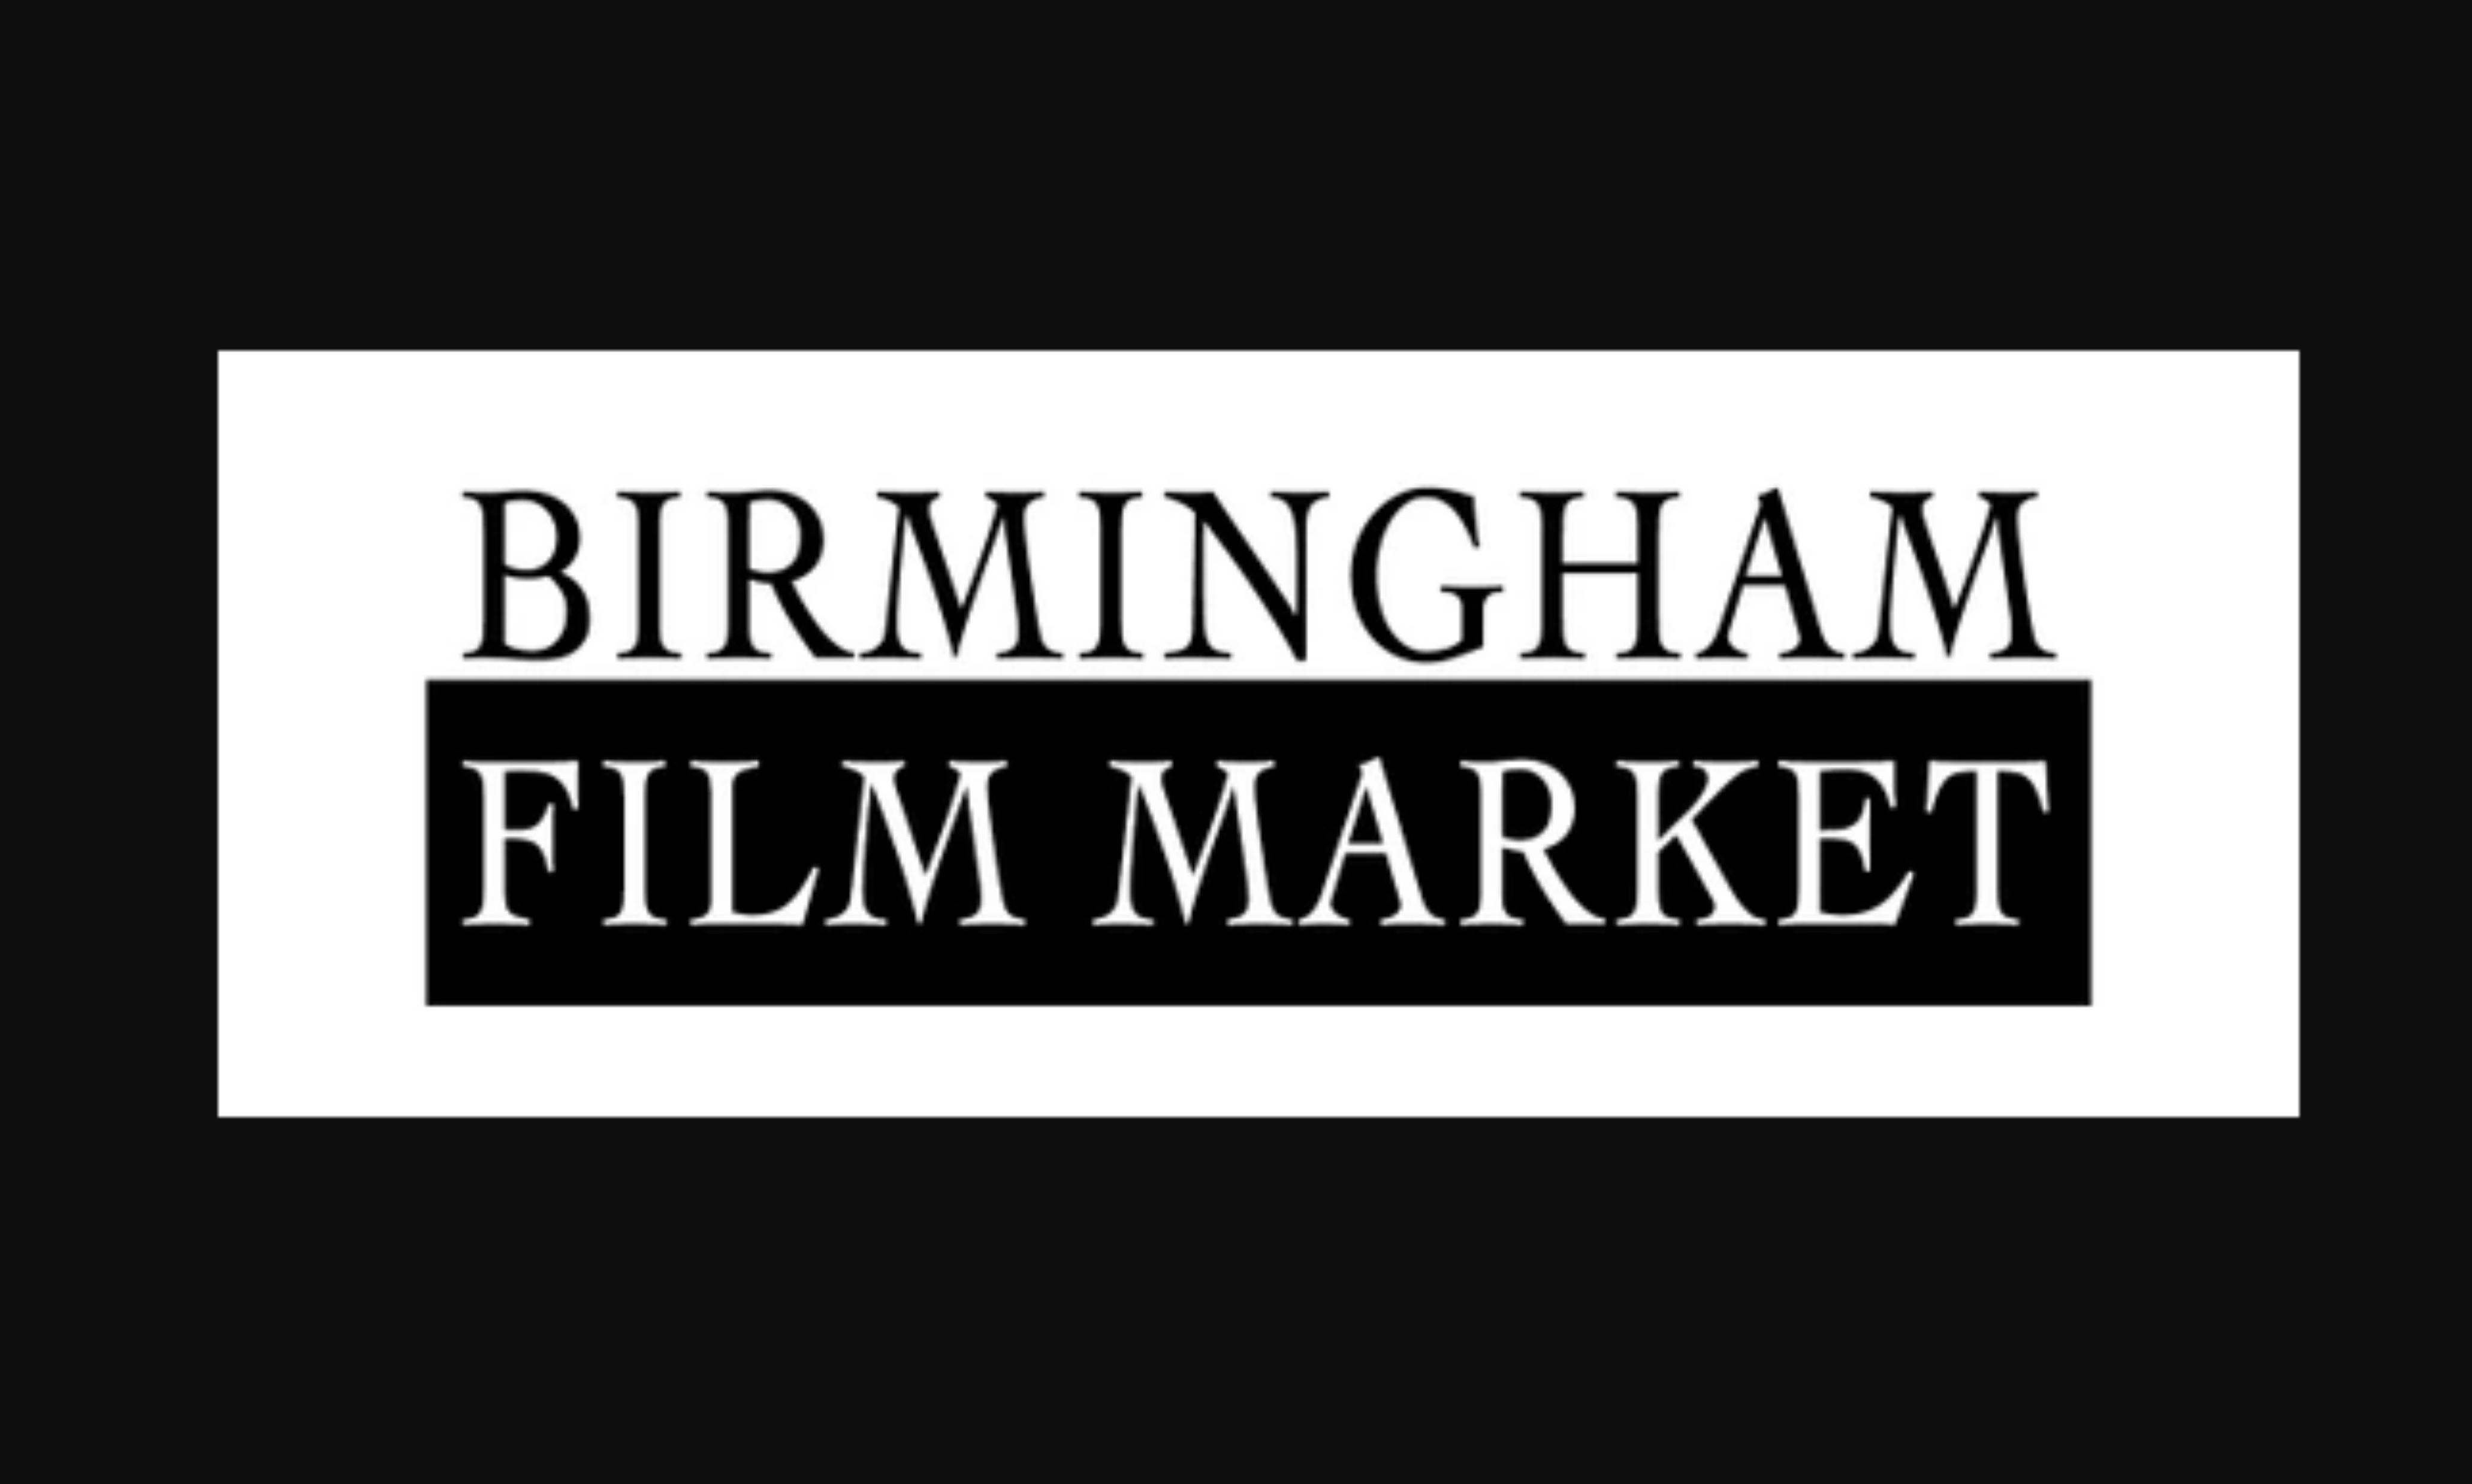 Birmingham Film Market Connects Filmmakers, Investors and Distributors